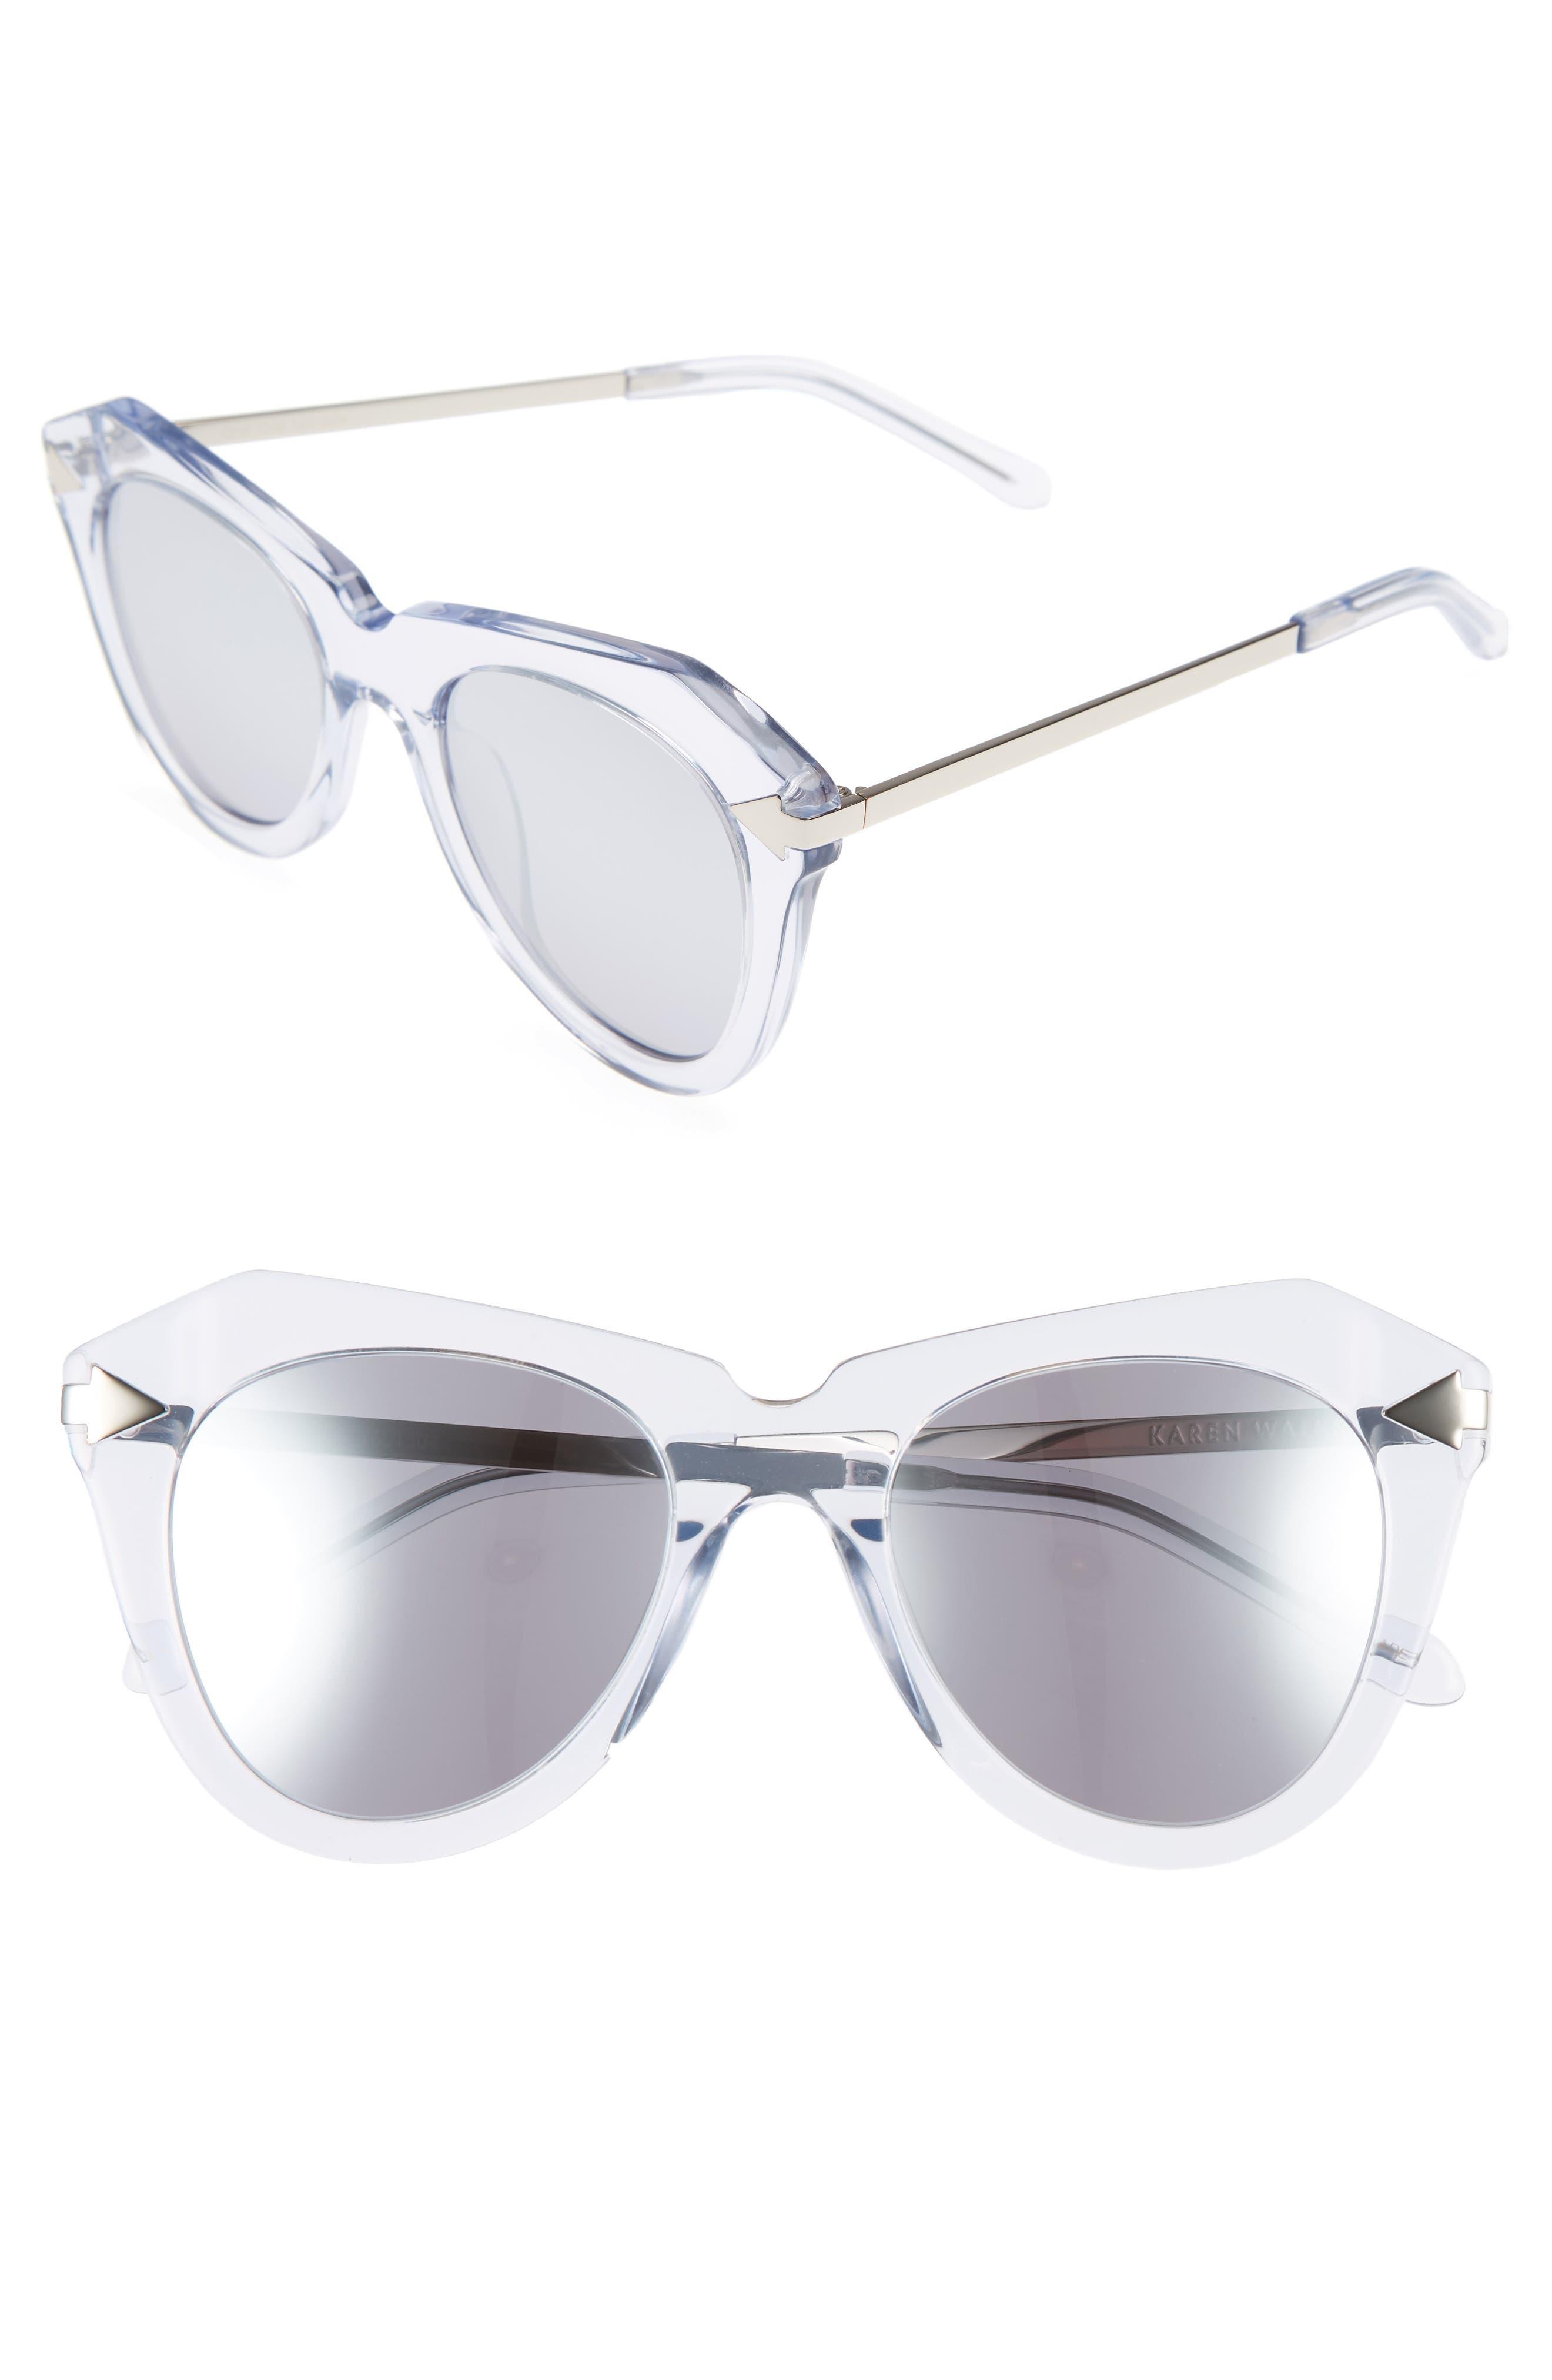 One Star 50mm Retro Sunglasses,                         Main,                         color, 100